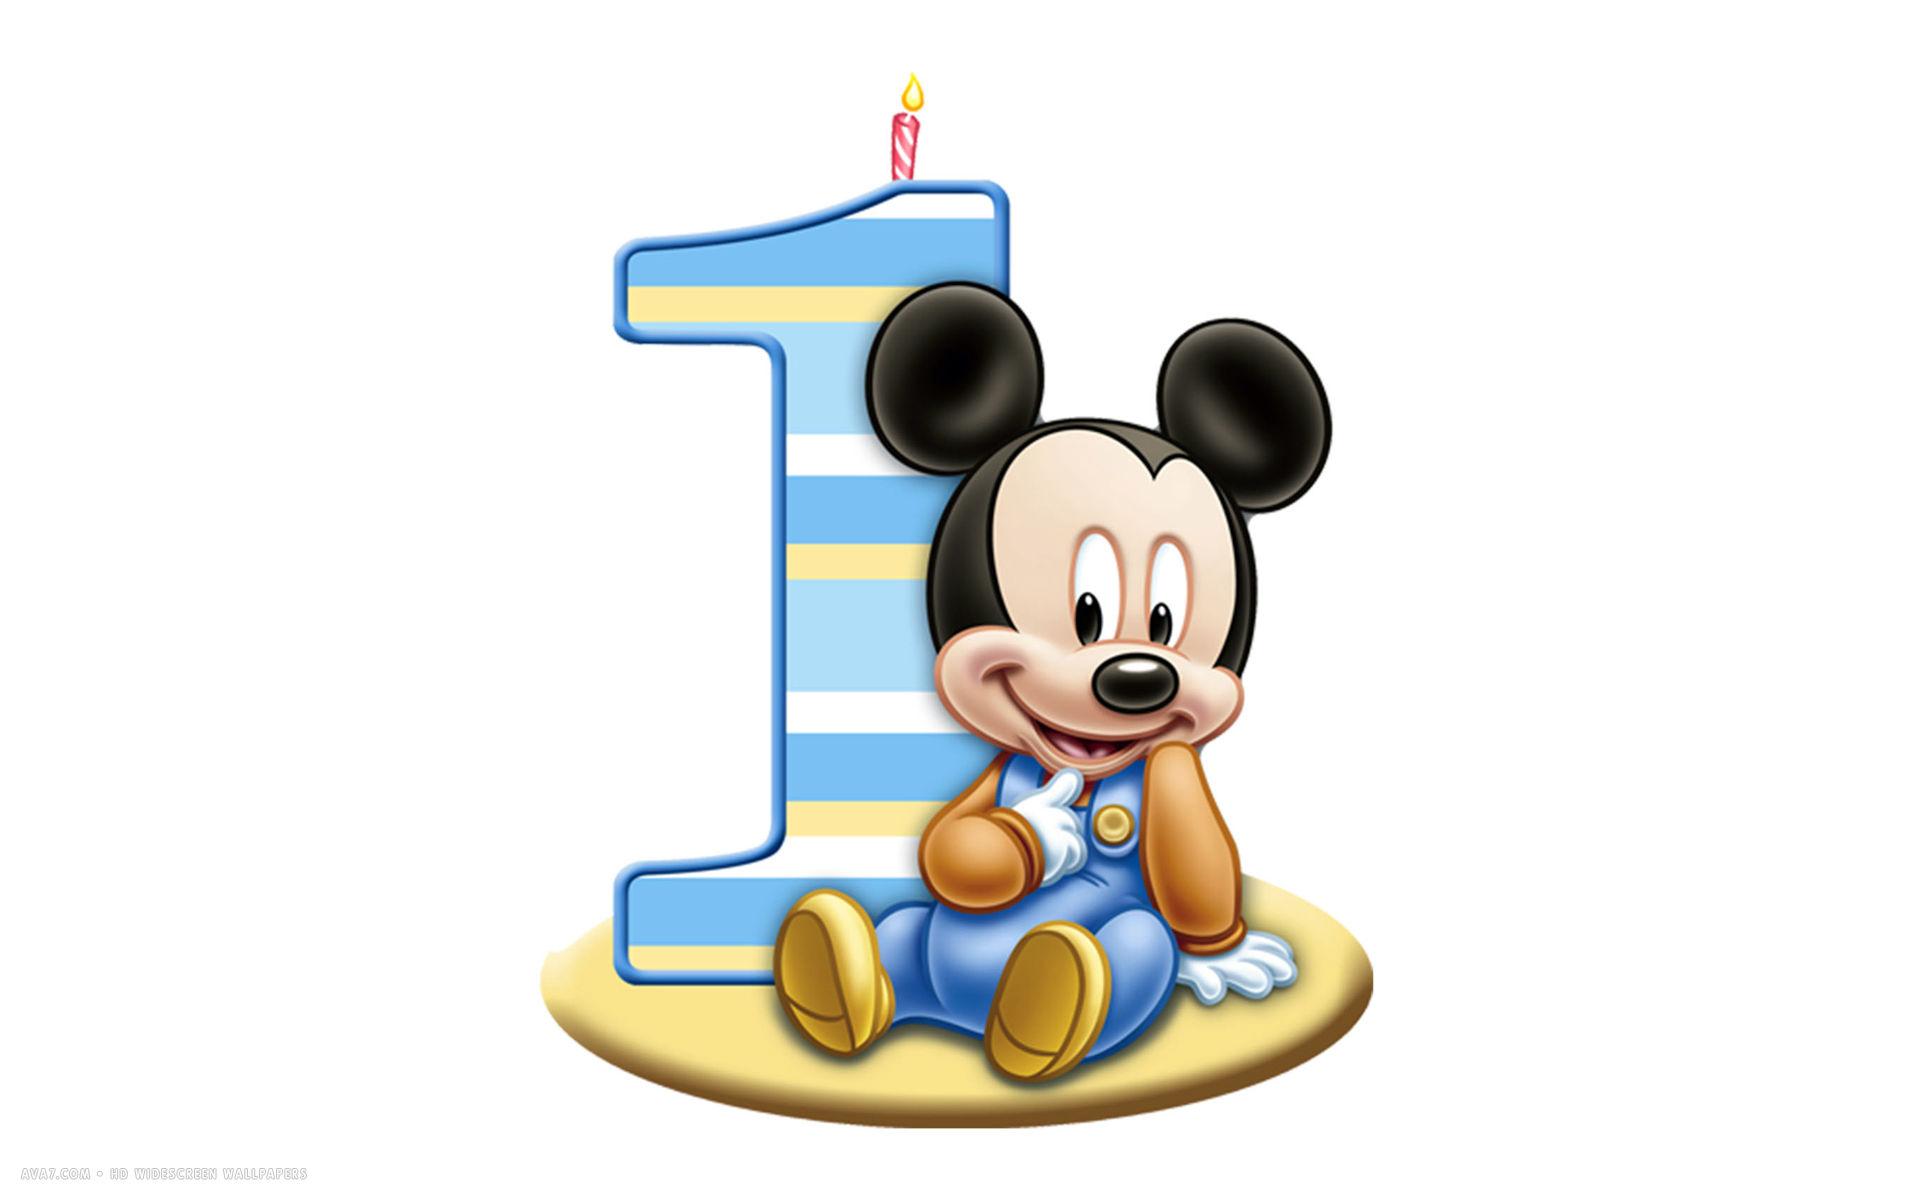 first birthday clipart free download best first birthday clipart rh clipartmag com birthday clipart free download birthday clipart free download